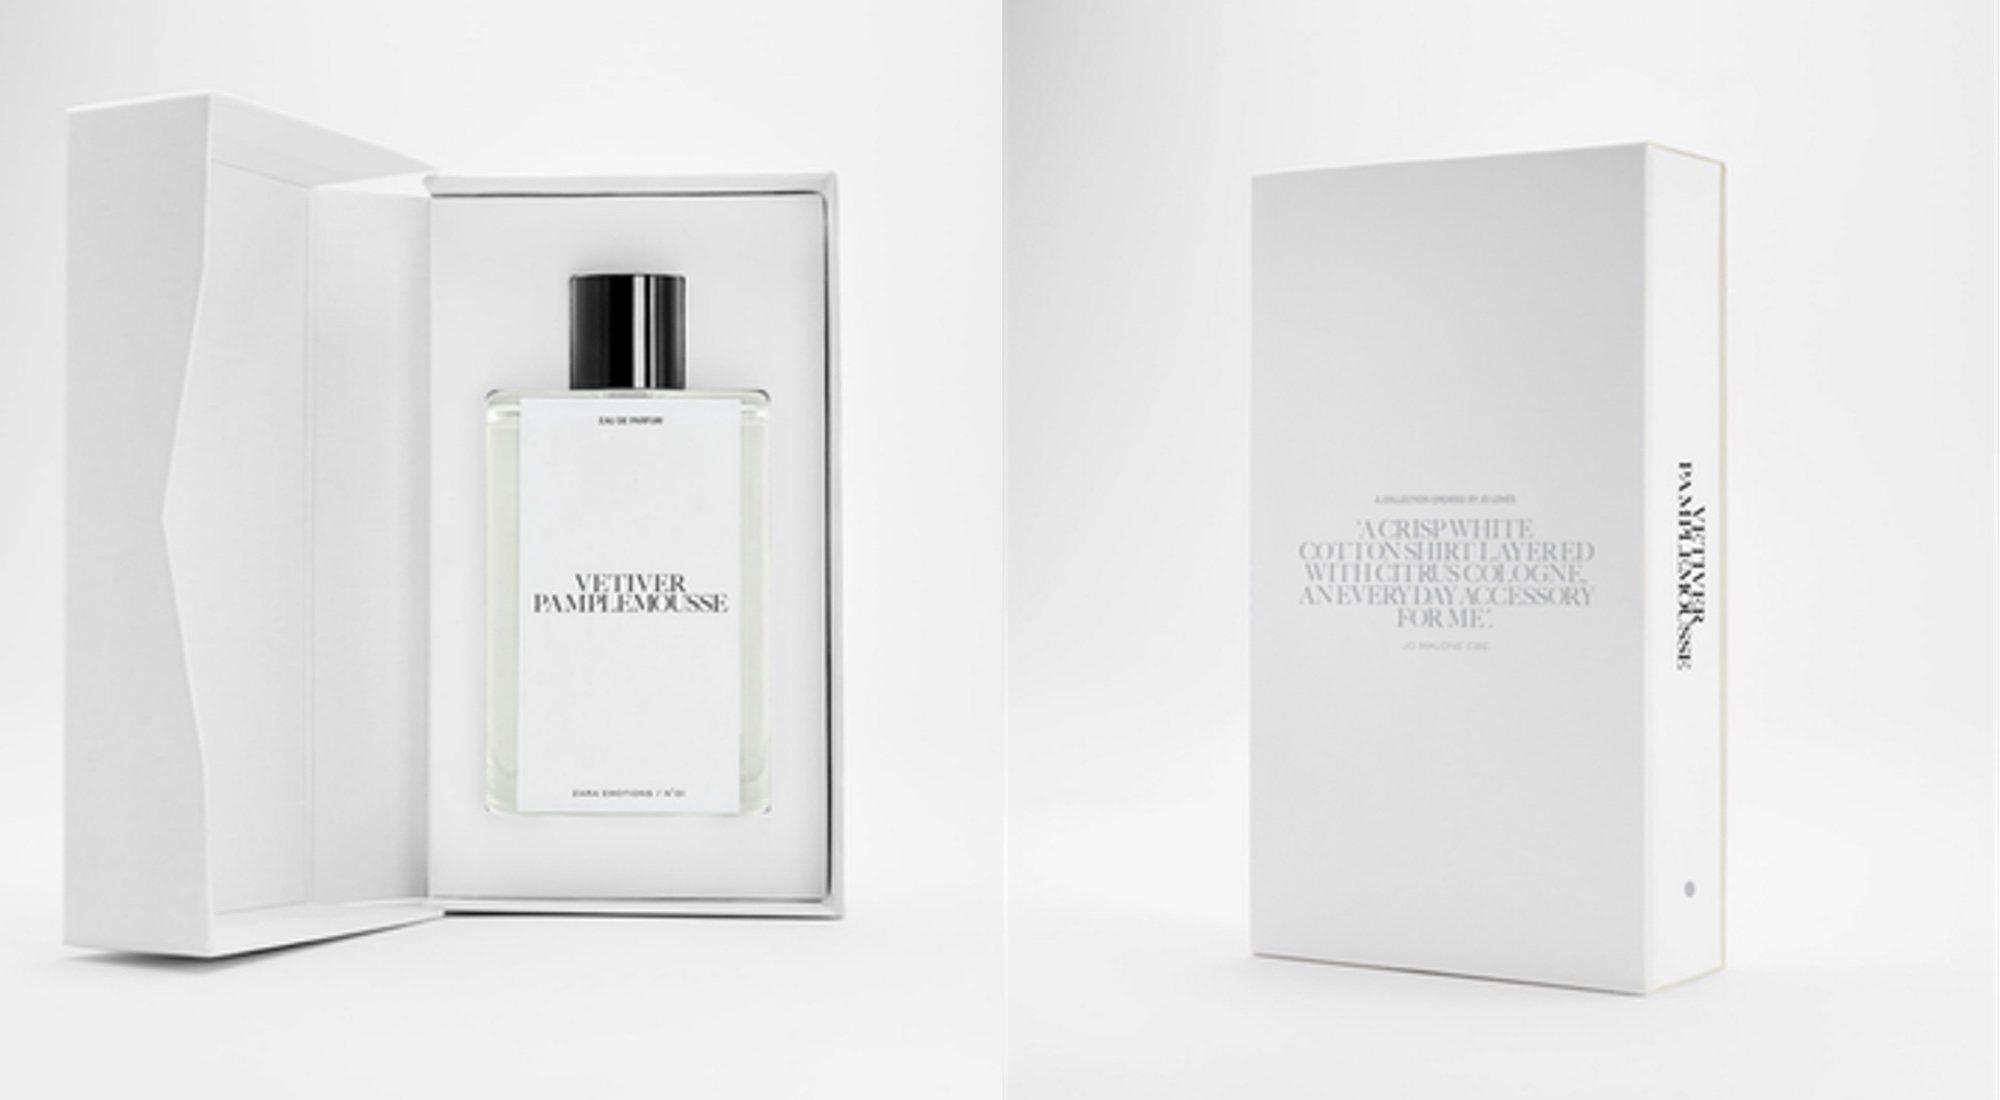 Zara Emotions by Jo Malone CBE: alta perfumería a precios competitivos